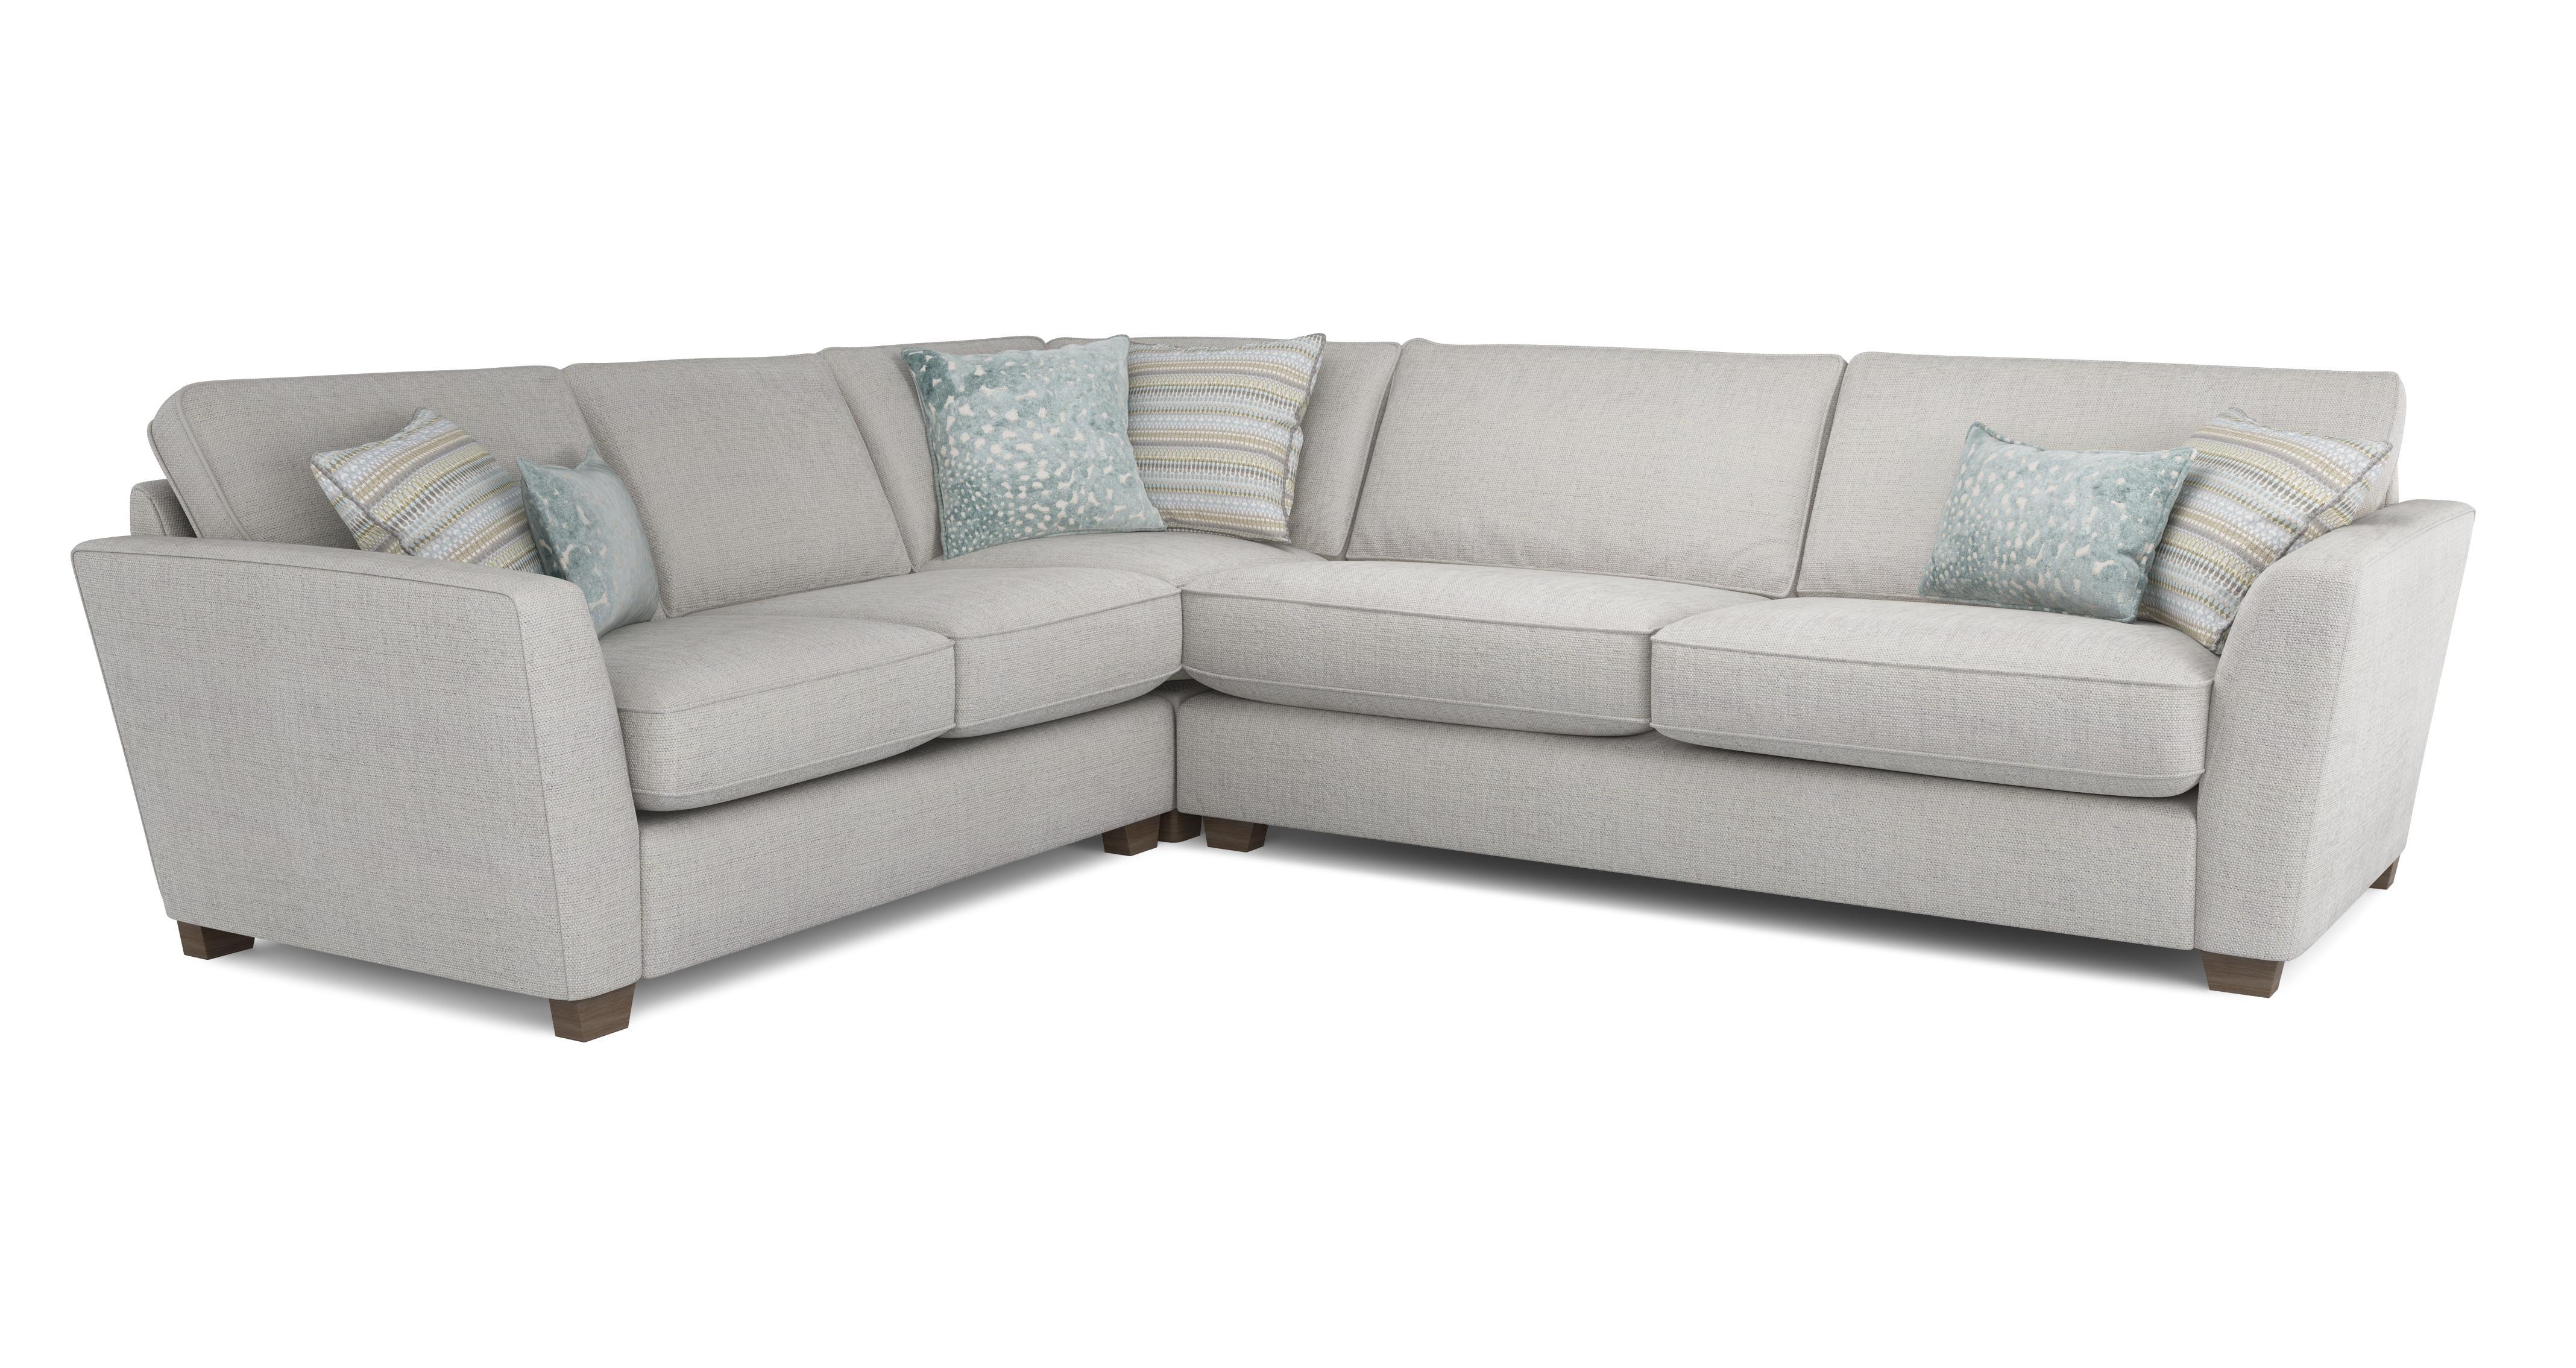 dfs sophia sofa reviews sure fit cover instructions sofia corner brokeasshome